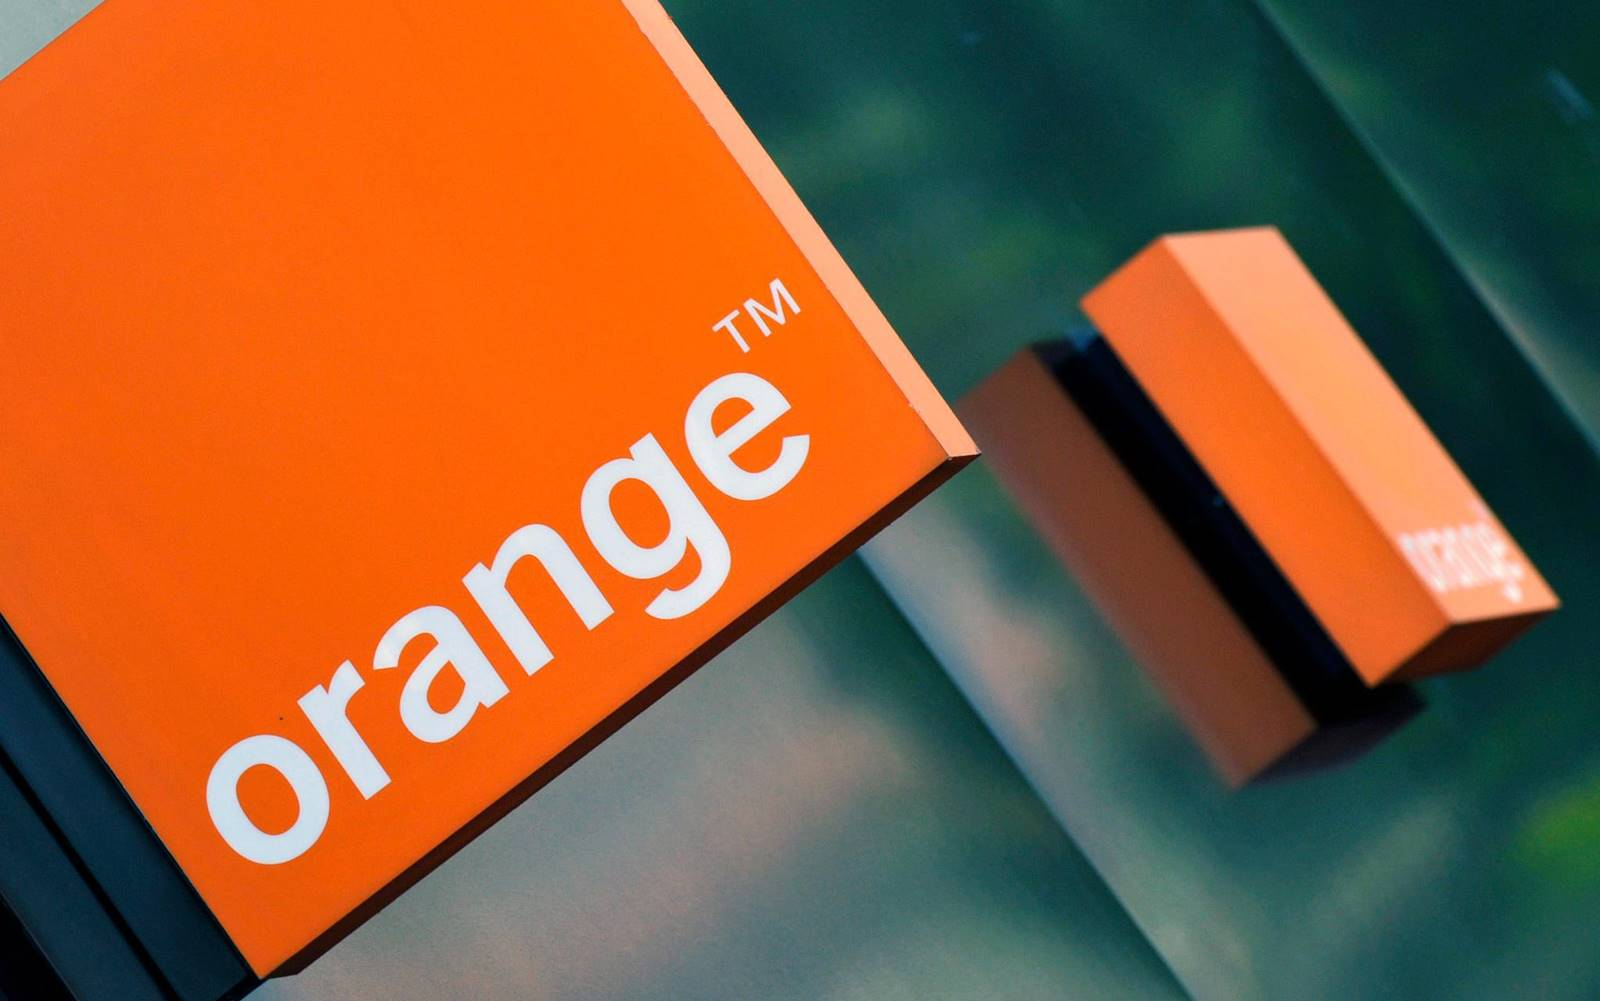 Orange CASTIGA Samsung GALAXY S10 Plus 1 TB